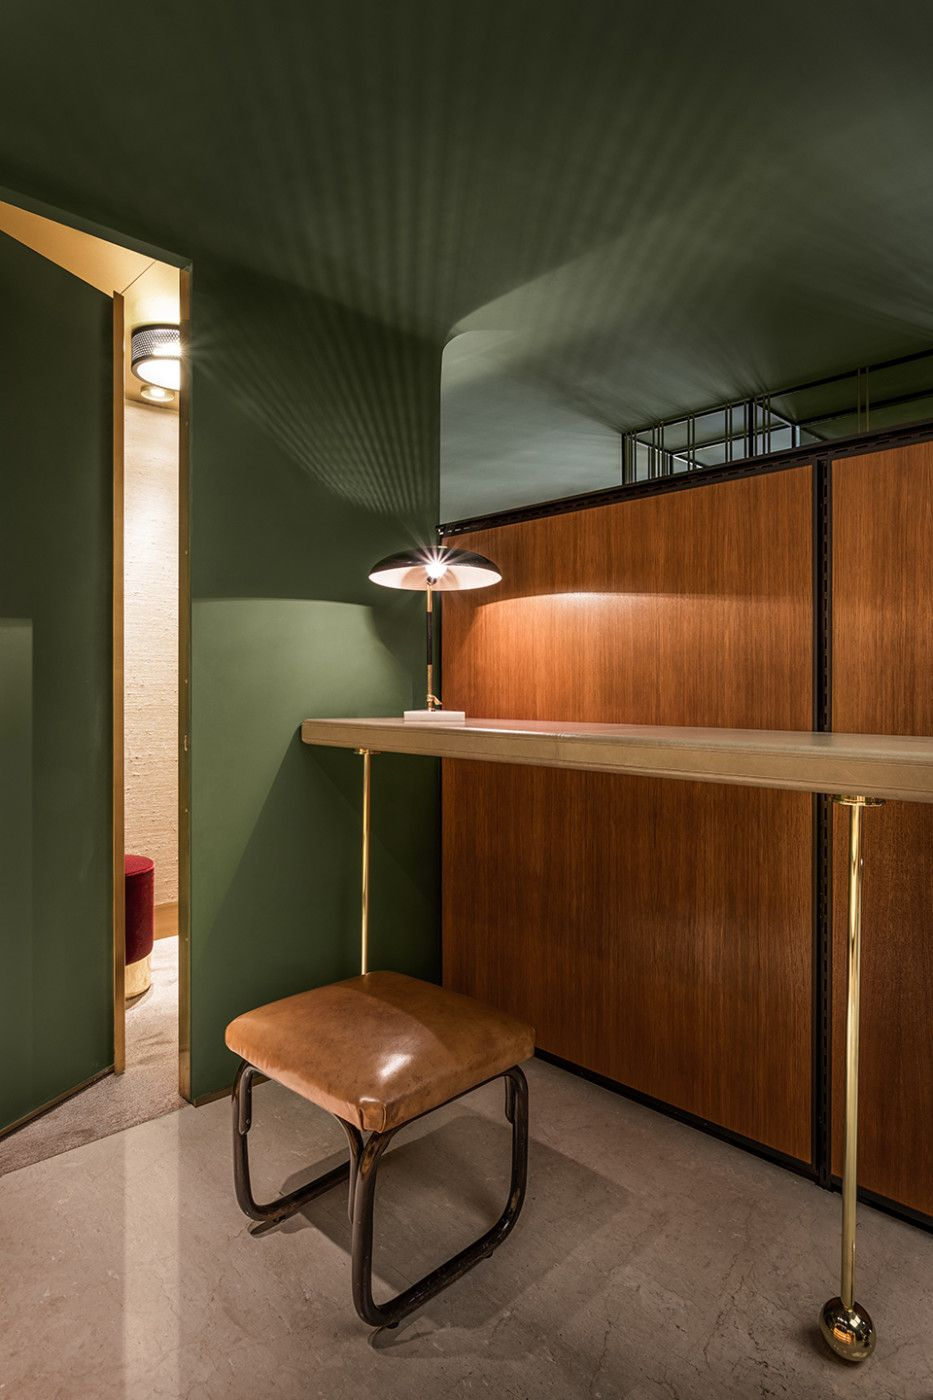 Studi Design Interni Milano.Dimore Studio Boglioli Milan Ph Simone Fiorini Detail Nel 2019